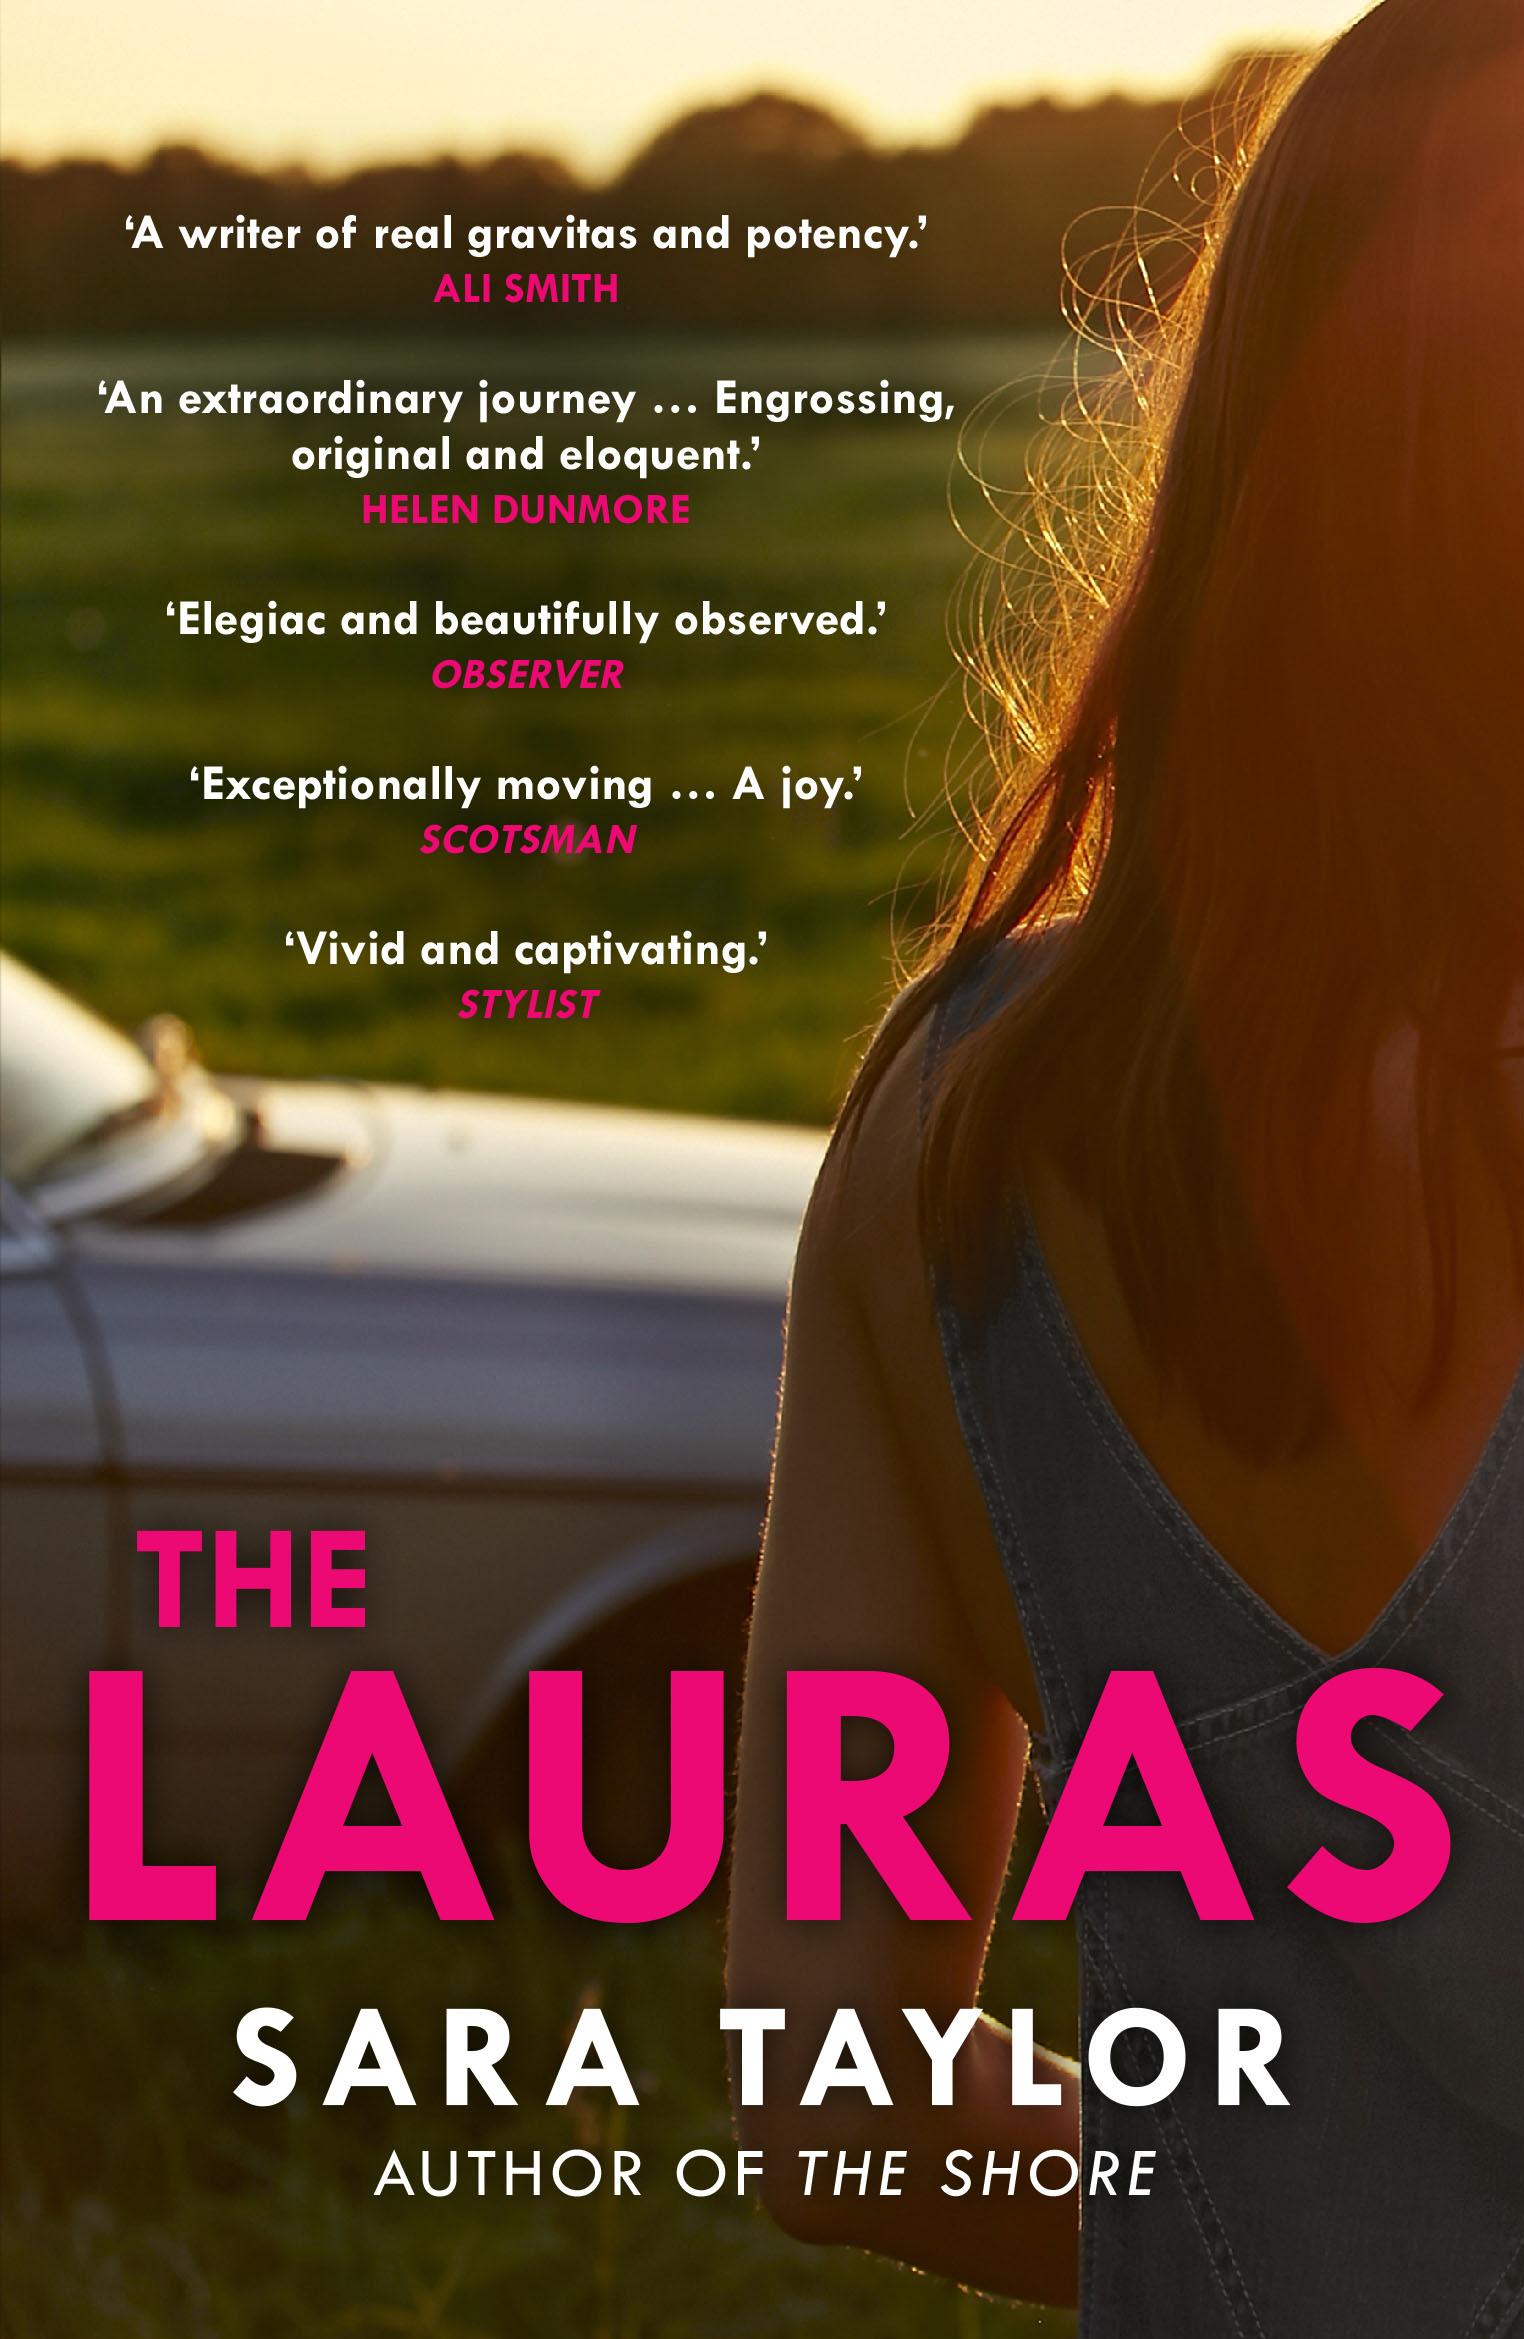 Sara Taylor - book cover.jpg